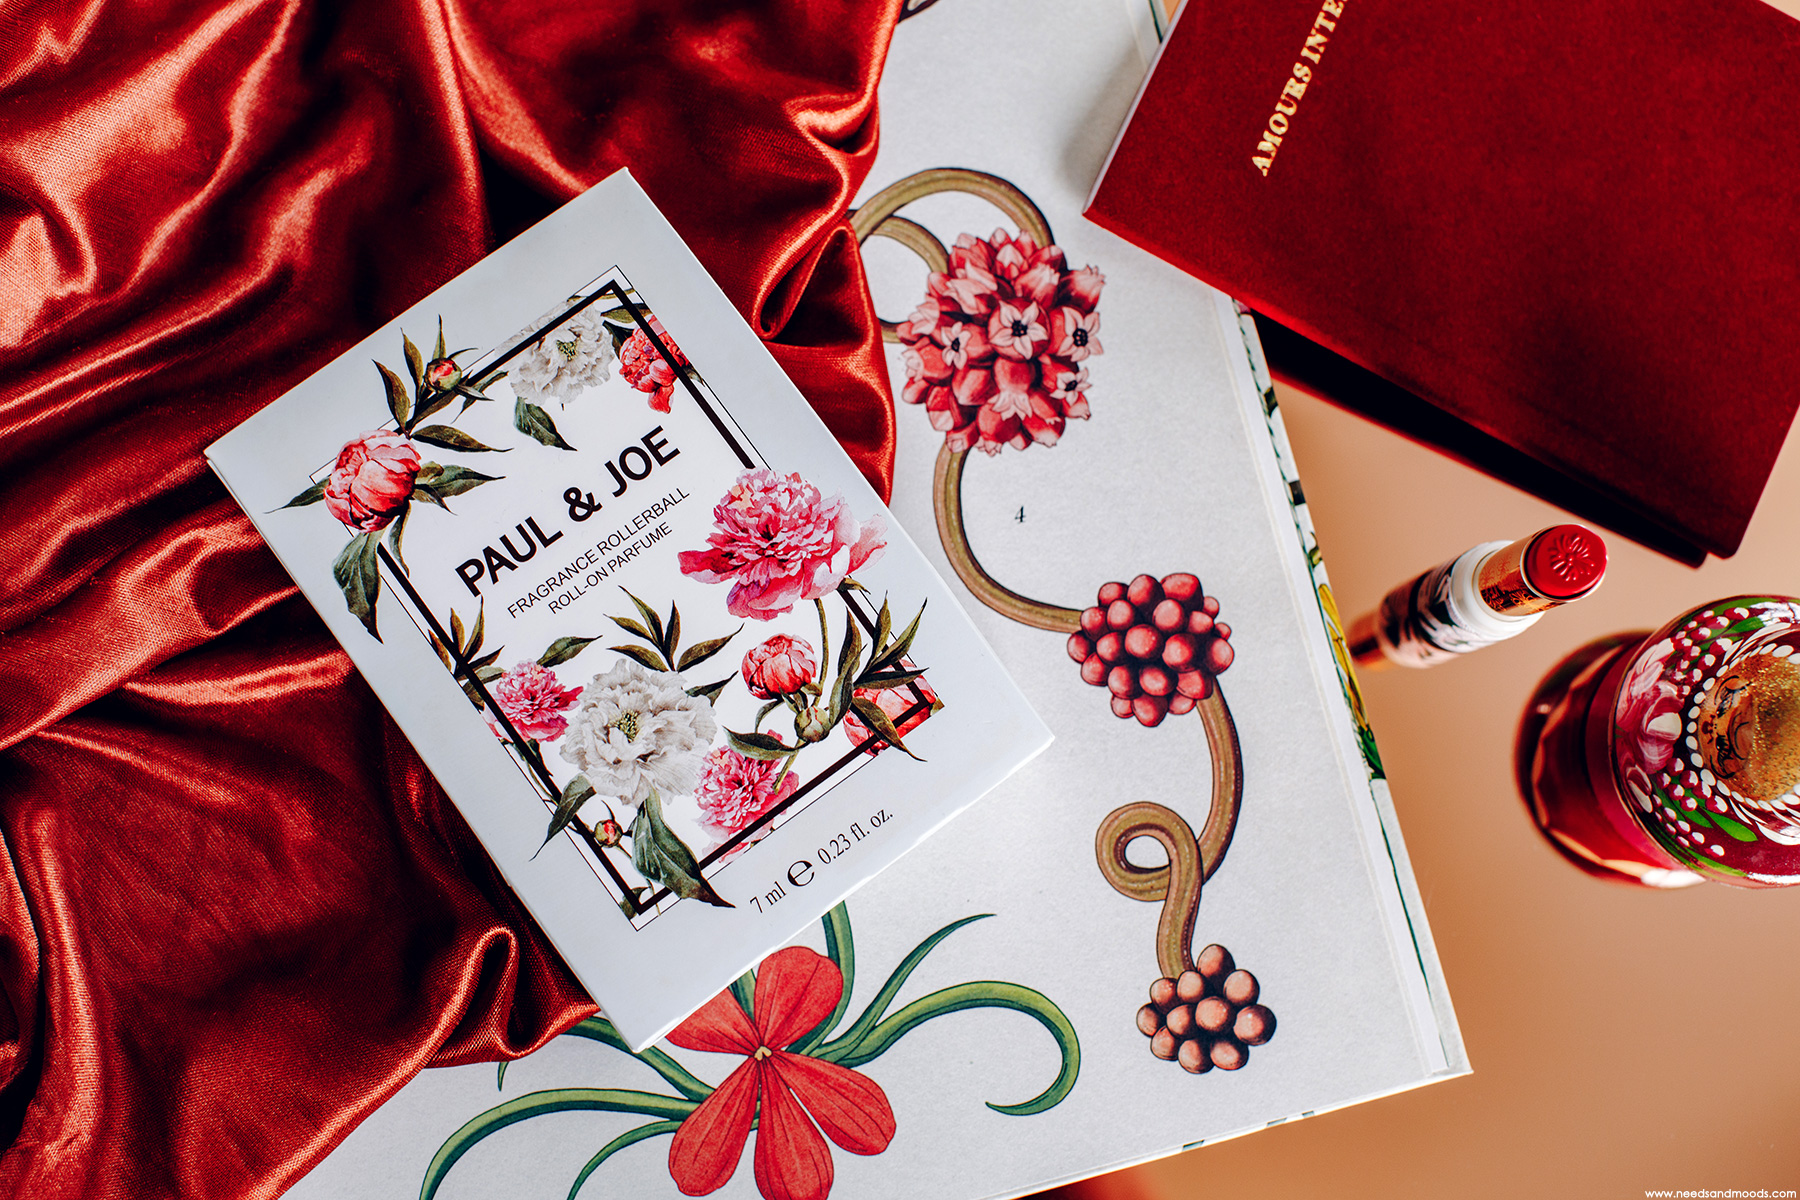 paul joe beaute fragrance rollerball 003